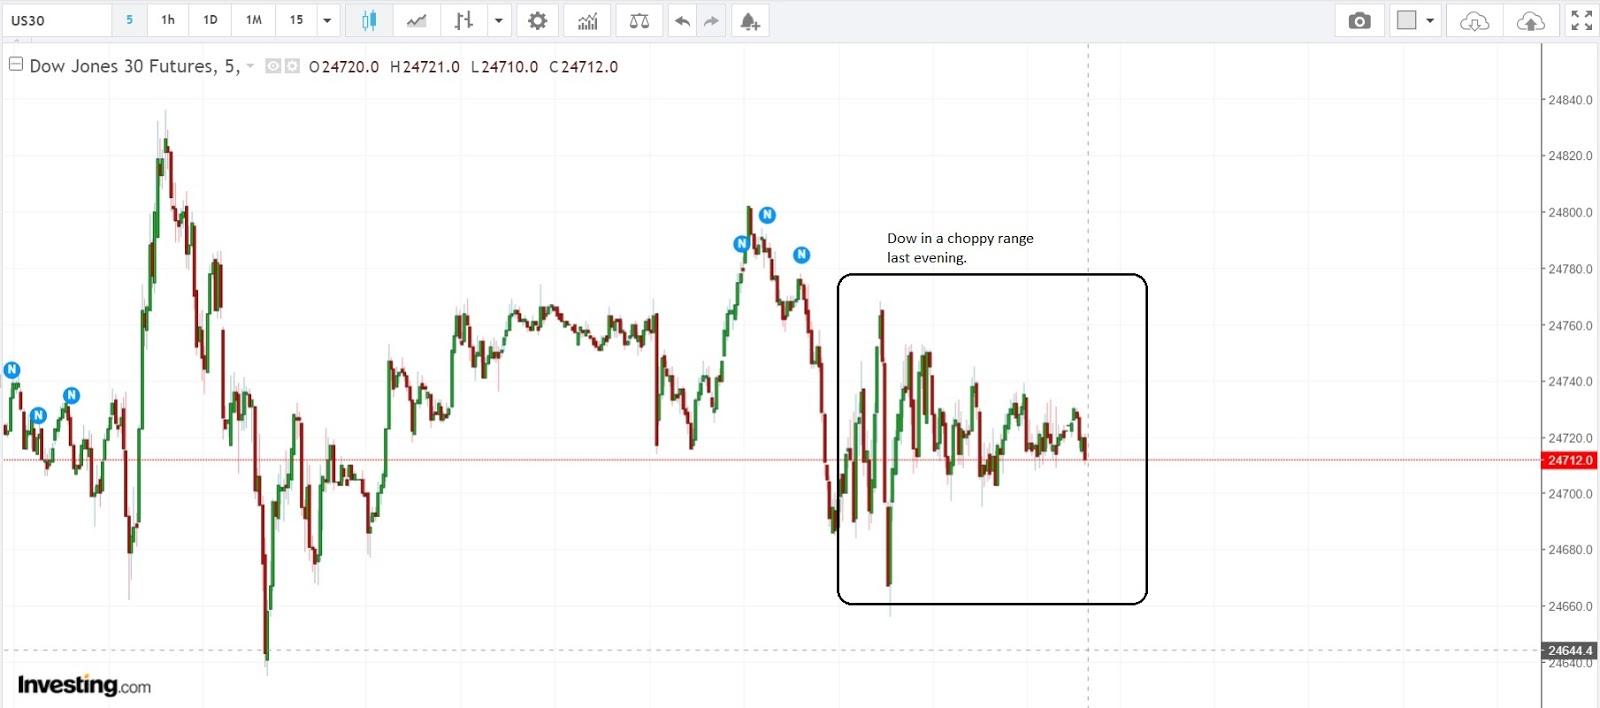 Stock Market Best-Kept Secrets: Dow Jones - LIVE Trading with Ronald K Part 6